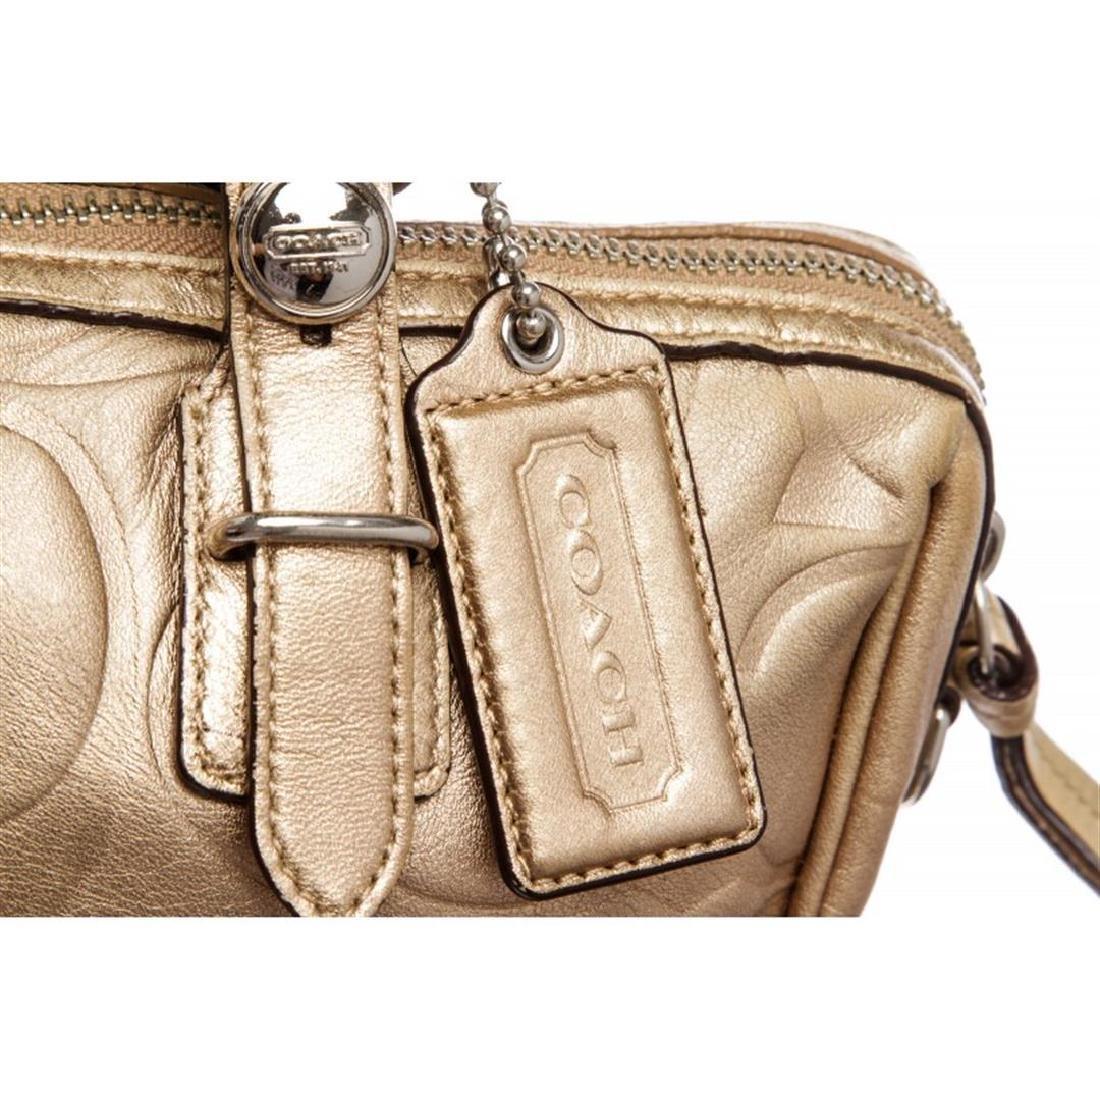 Coach Metallic Gold Monogram Leather Tote Bag - 5